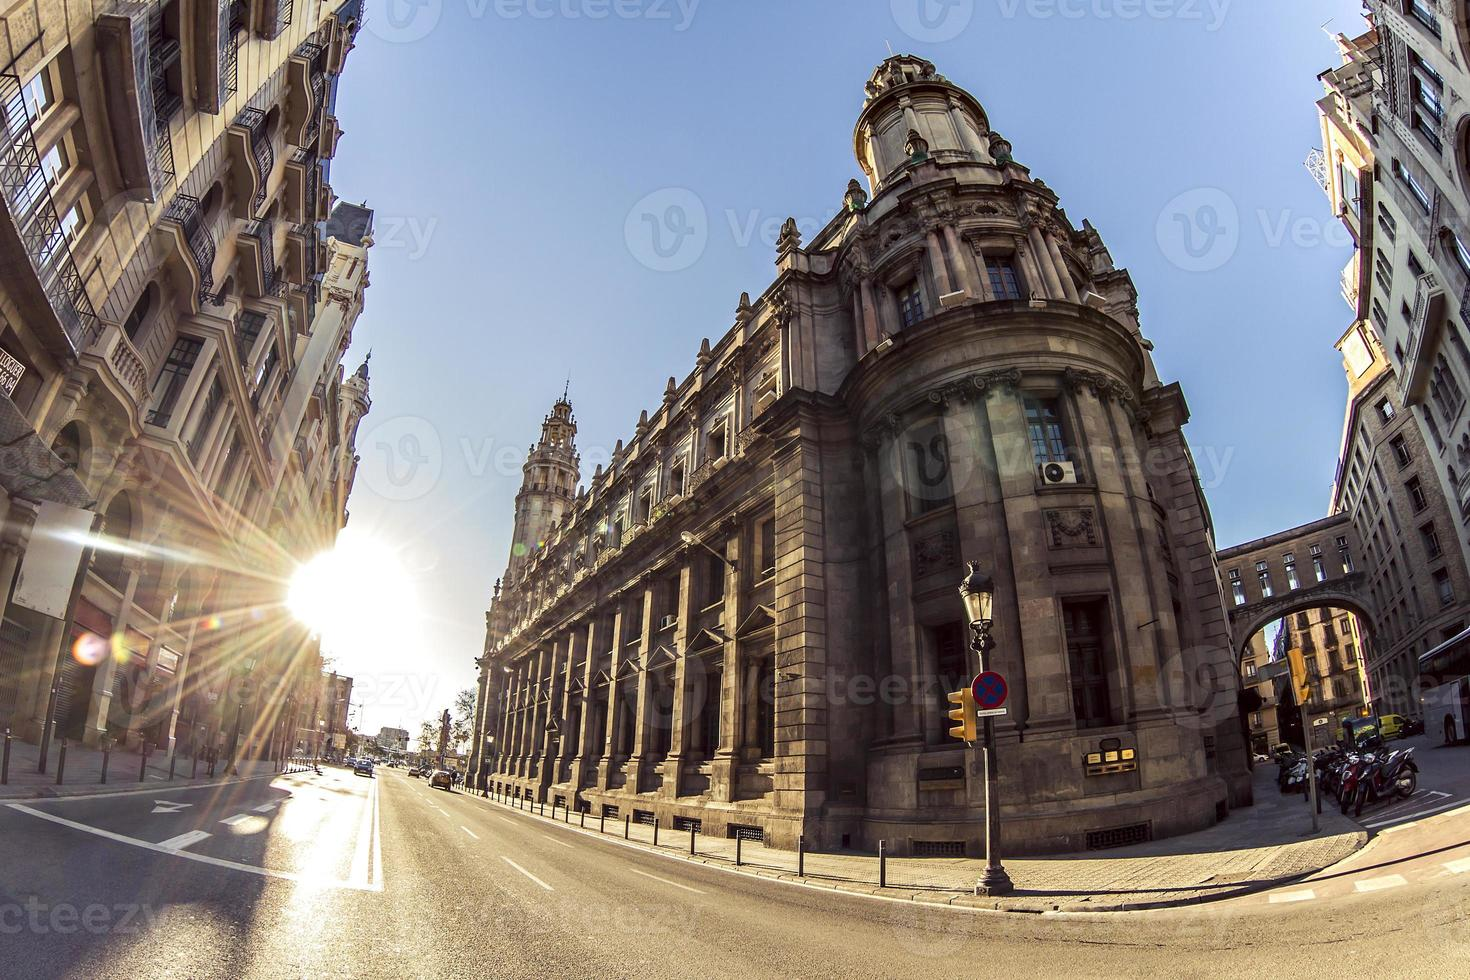 belos detalhes da arquitetura foto